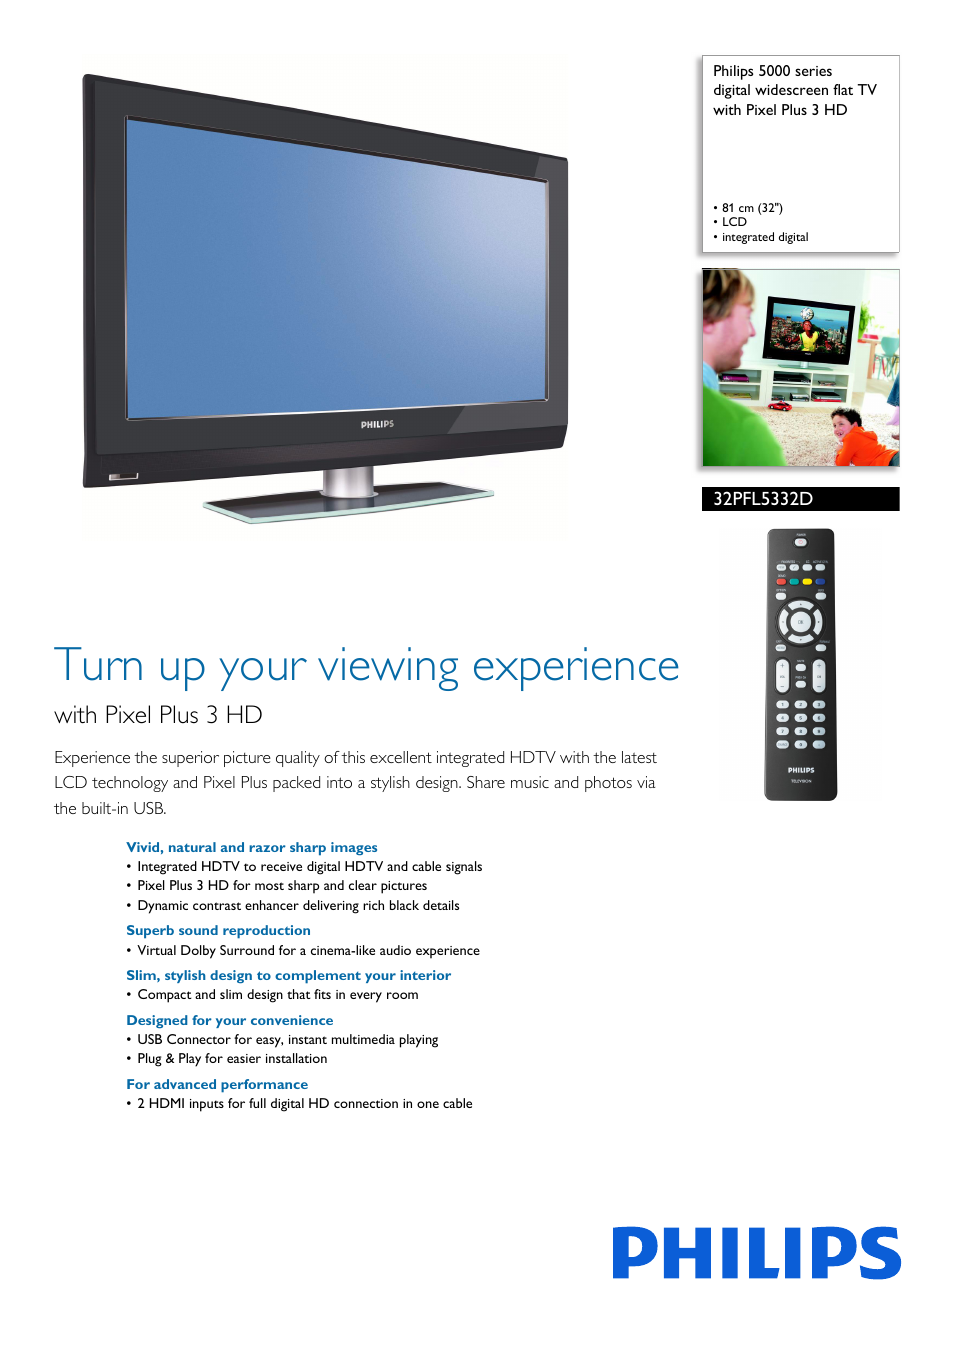 philips 32pfl5332d 37 user manual 3 pages rh manualsdir com Vizio TV Manual Samsung Rear Projection TV Manual